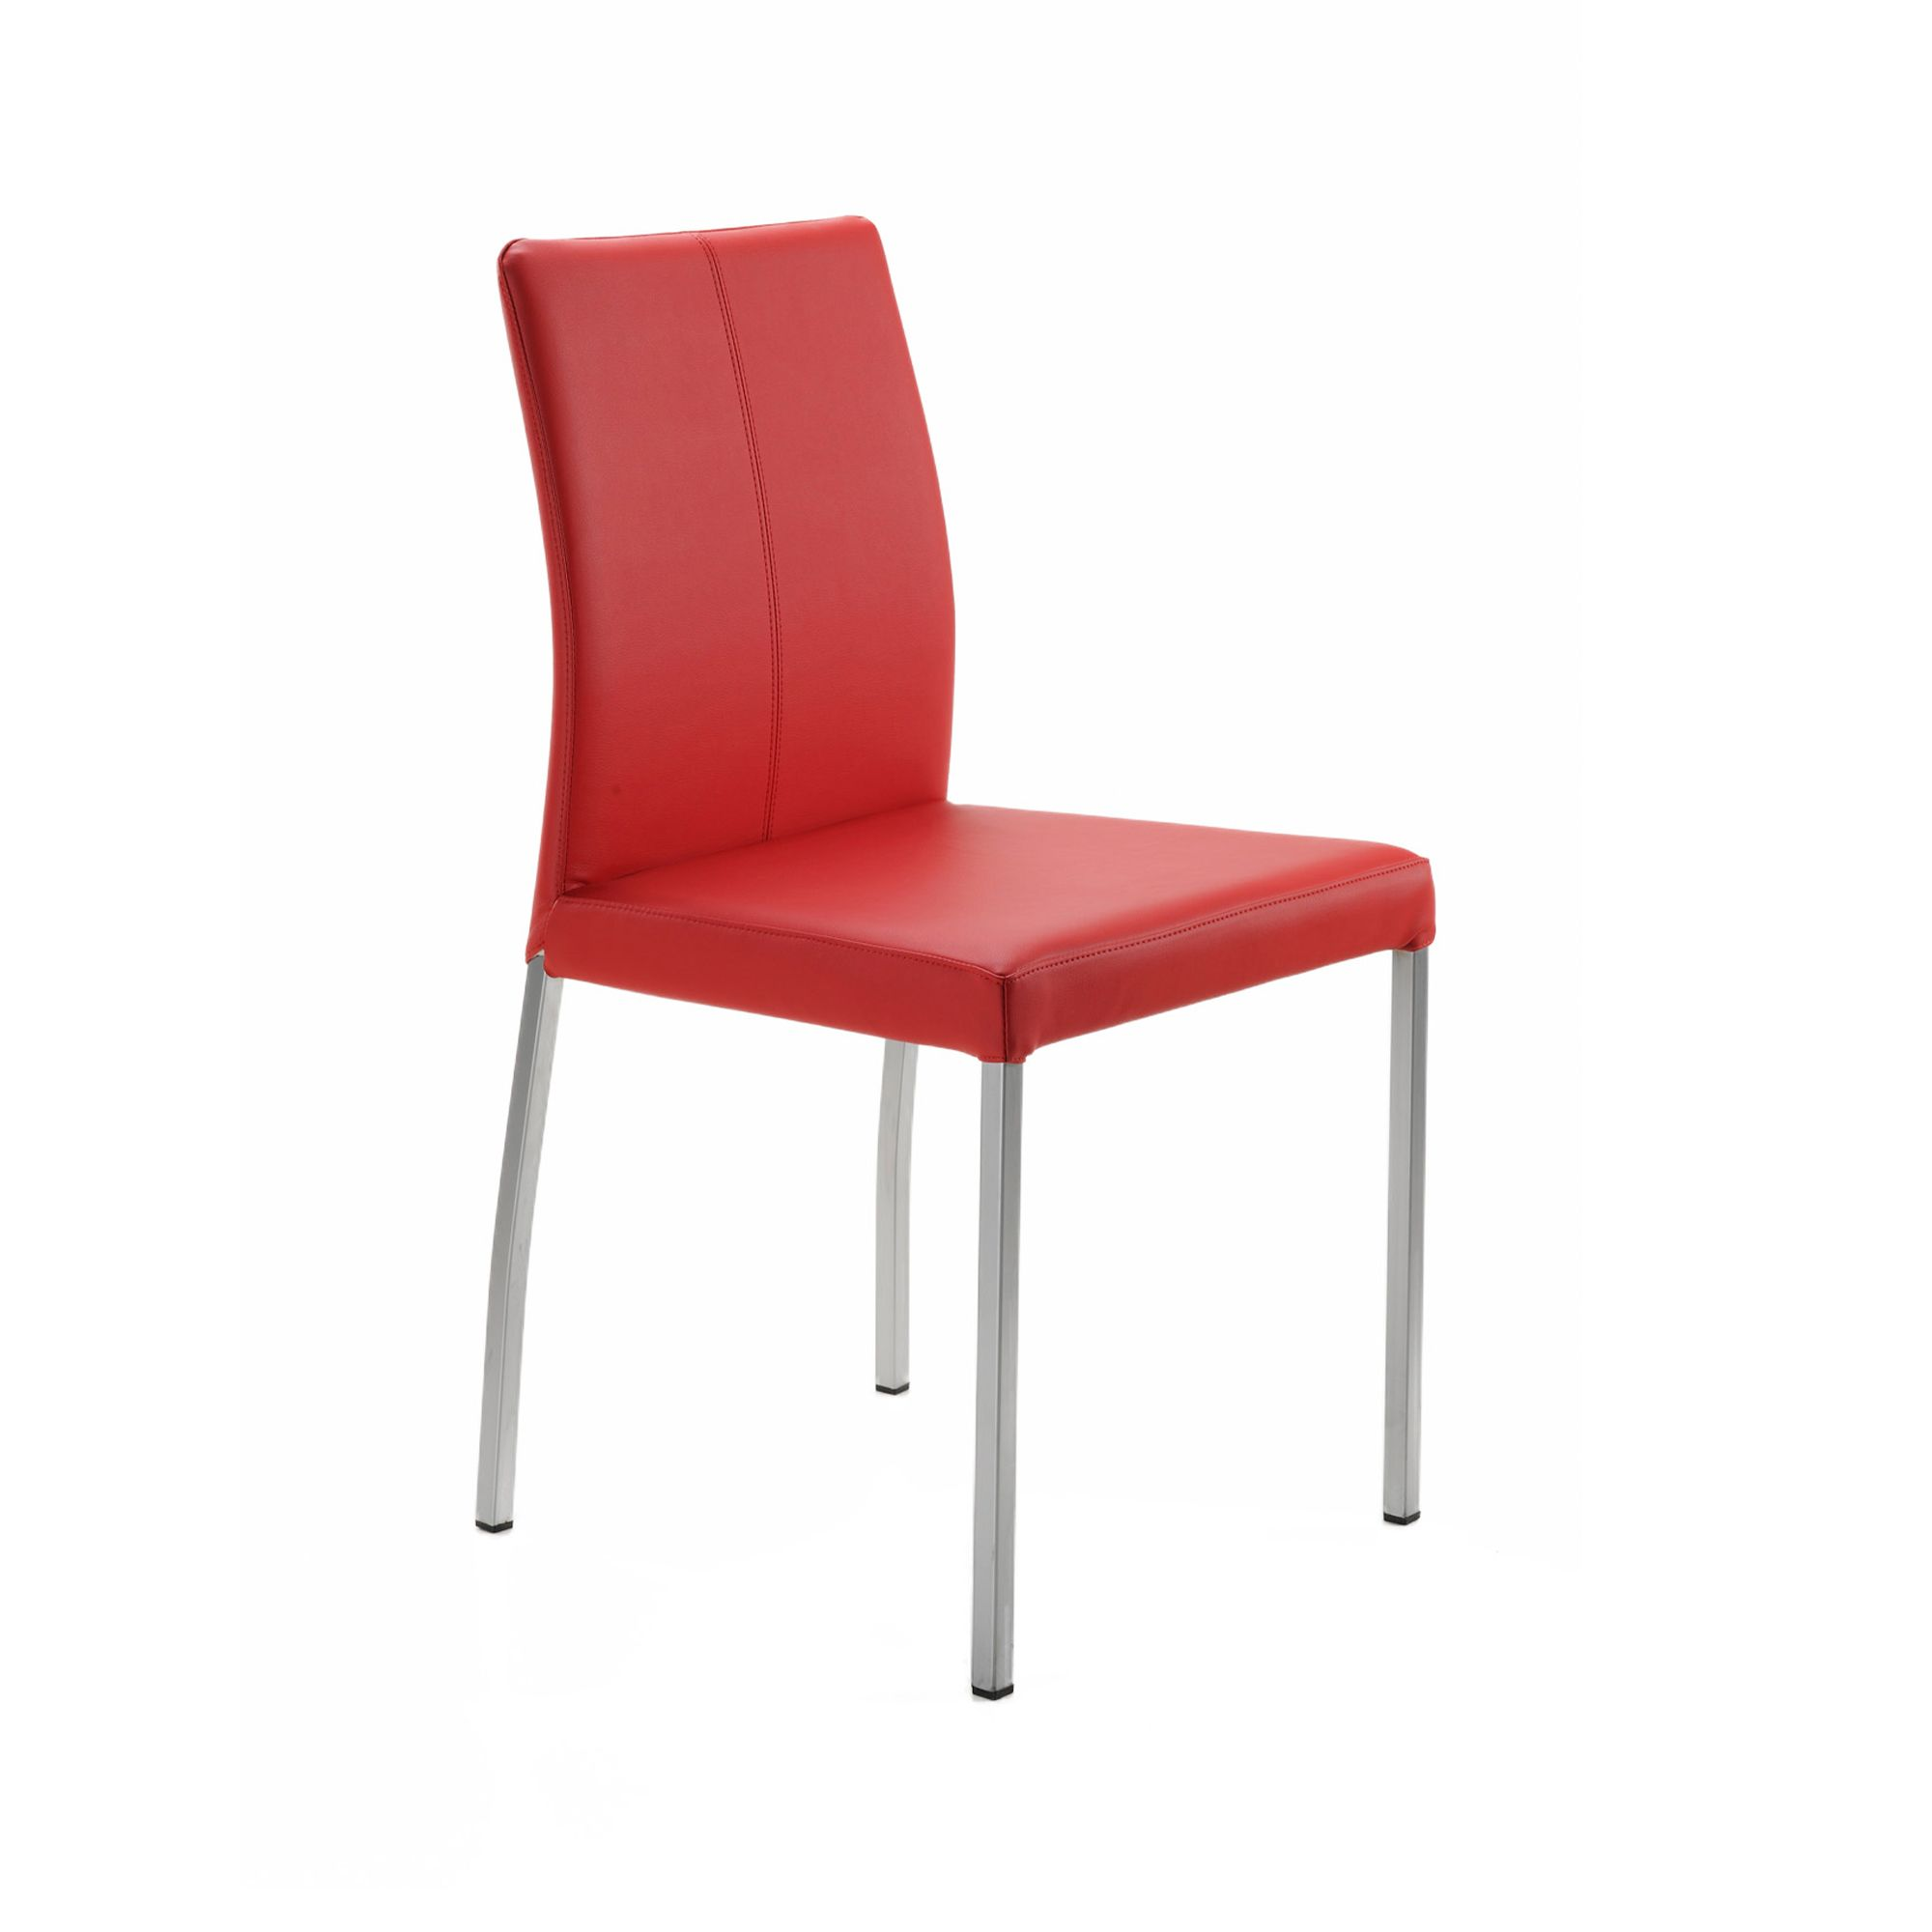 Model 906 chair in modern style